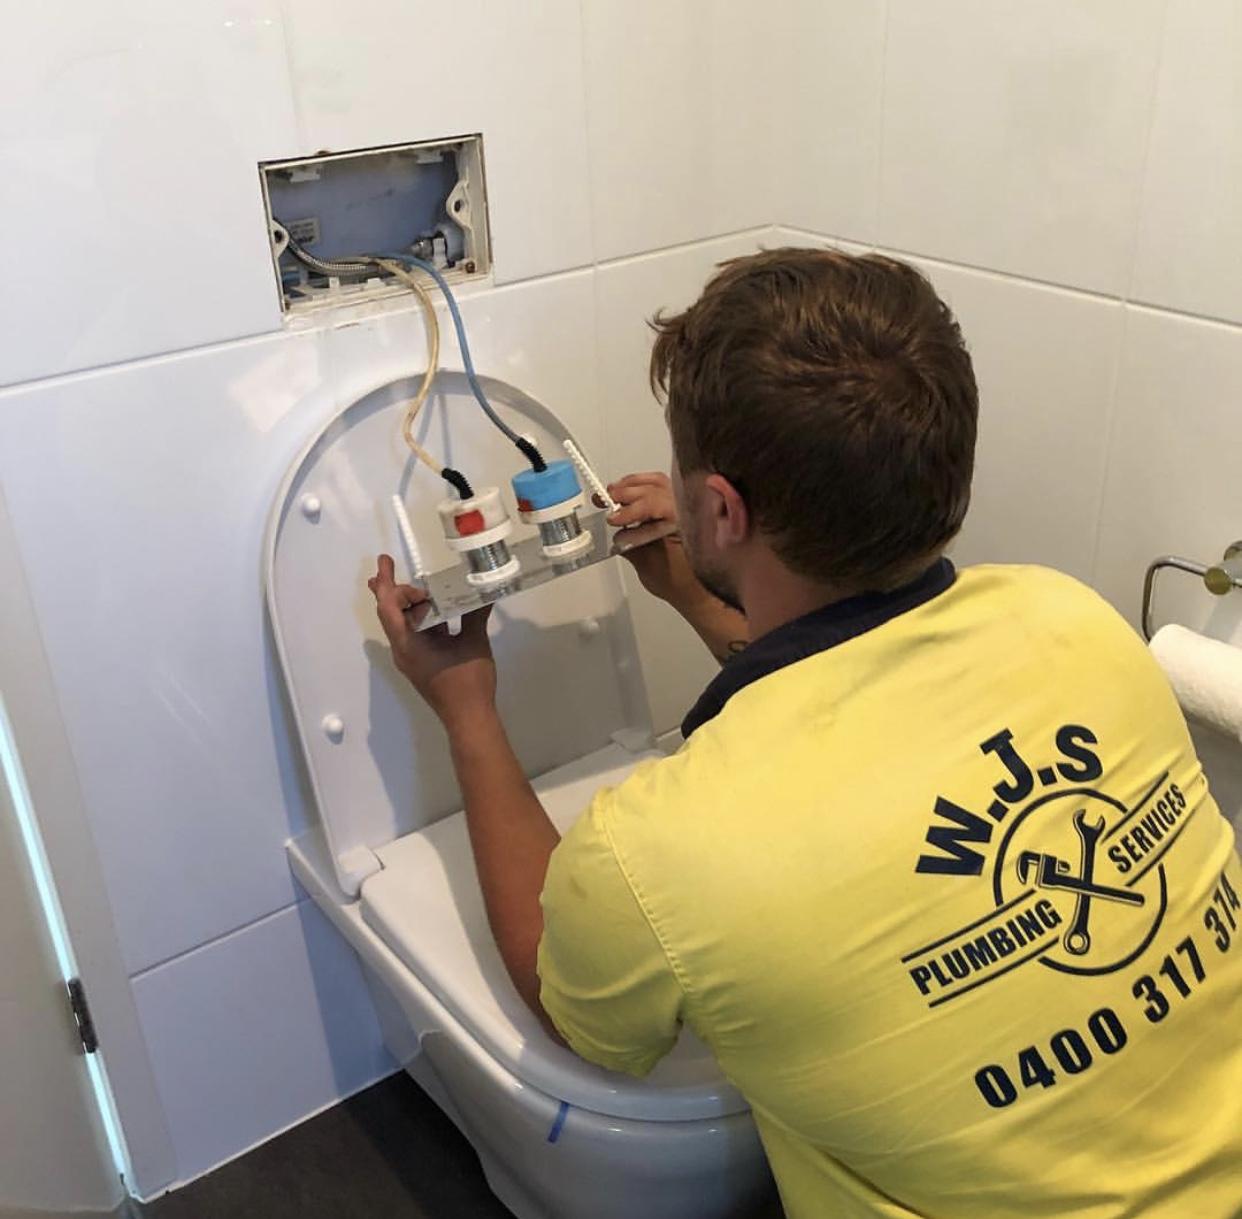 Repaired toilet